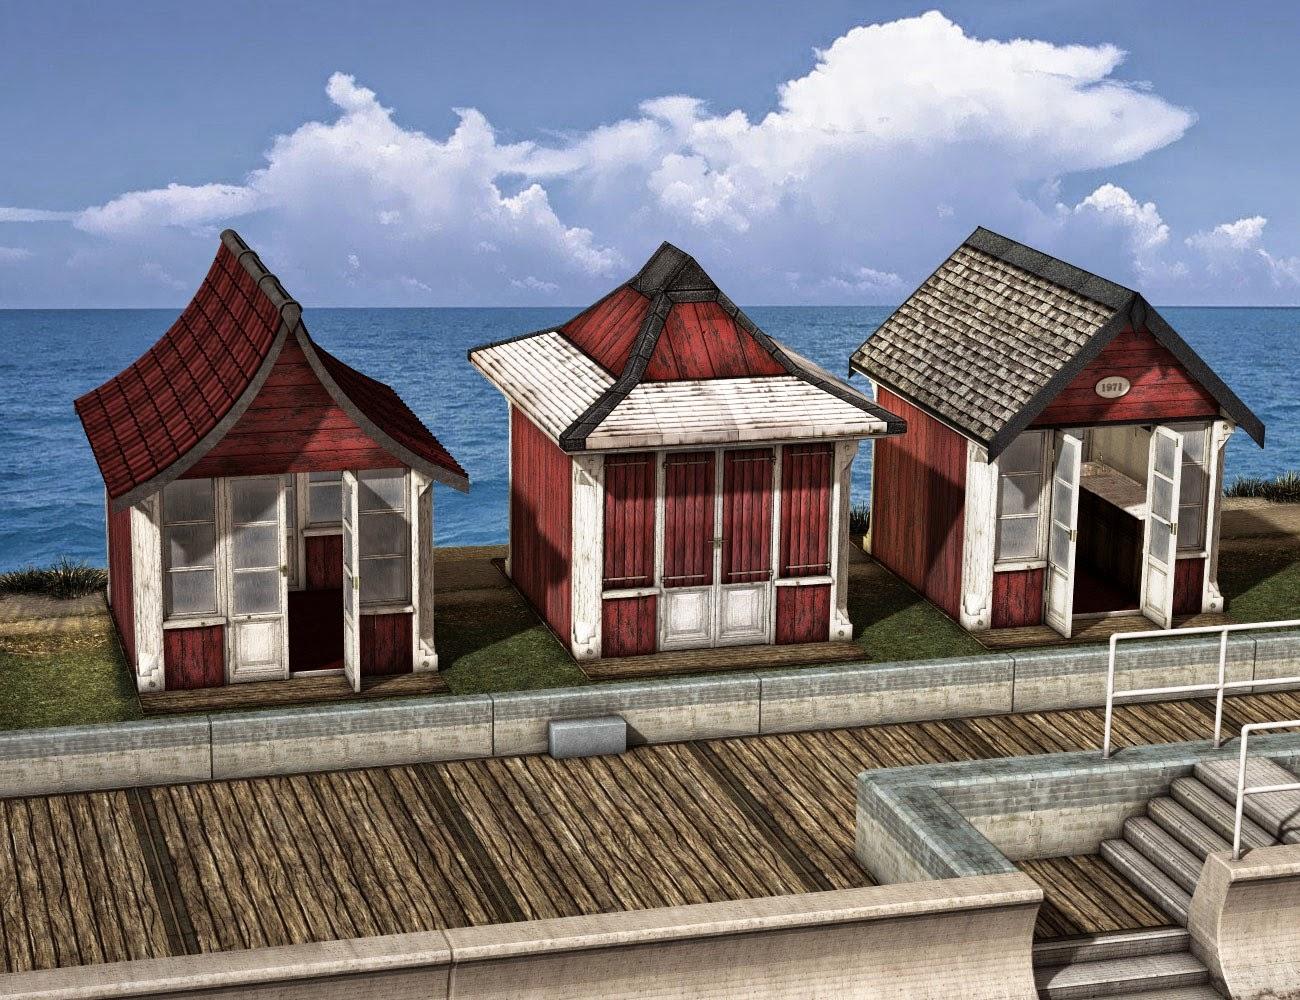 Boardwalk Beach Huts